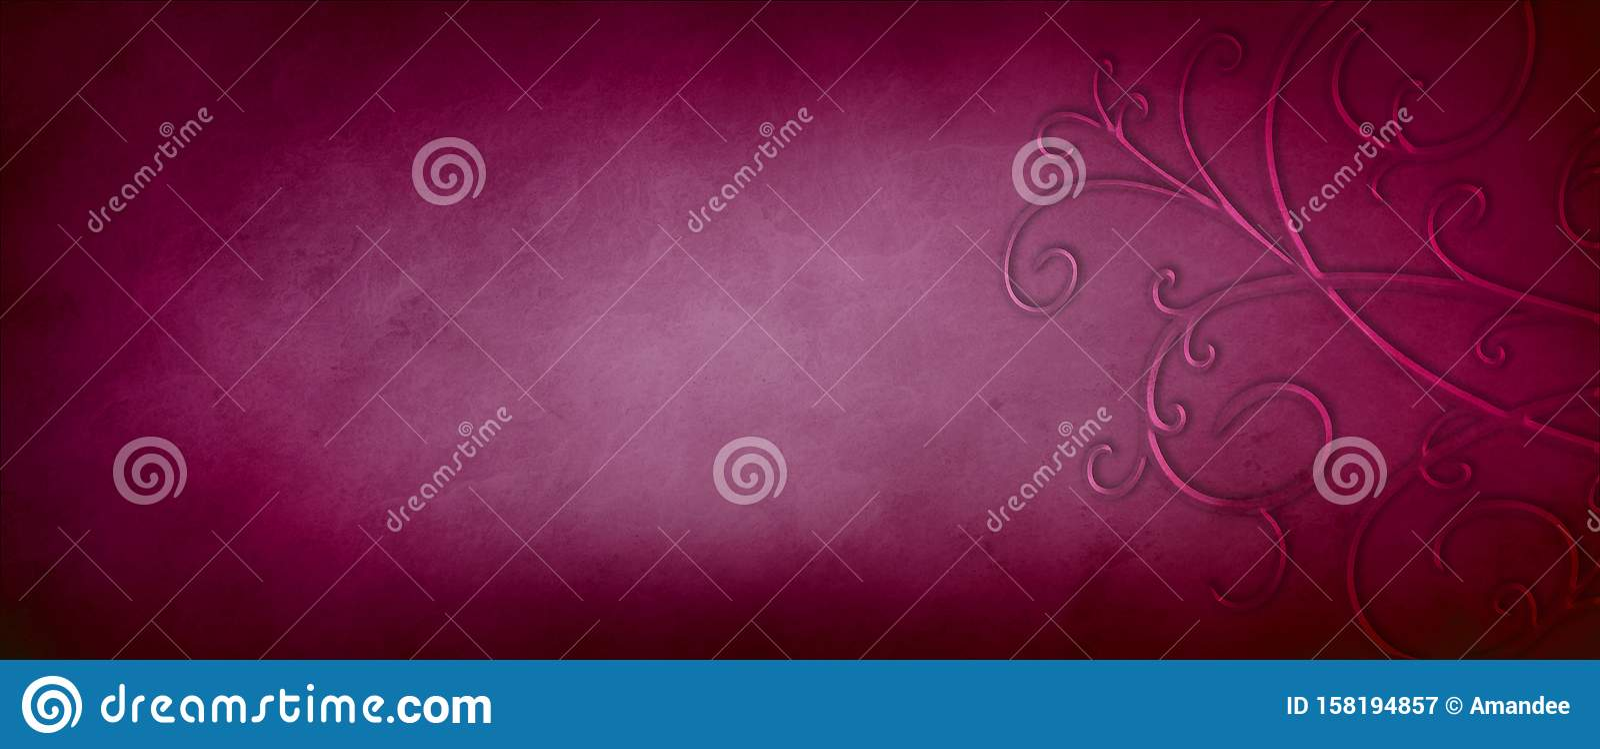 fond rouge bourgogne ou rose fonce avec